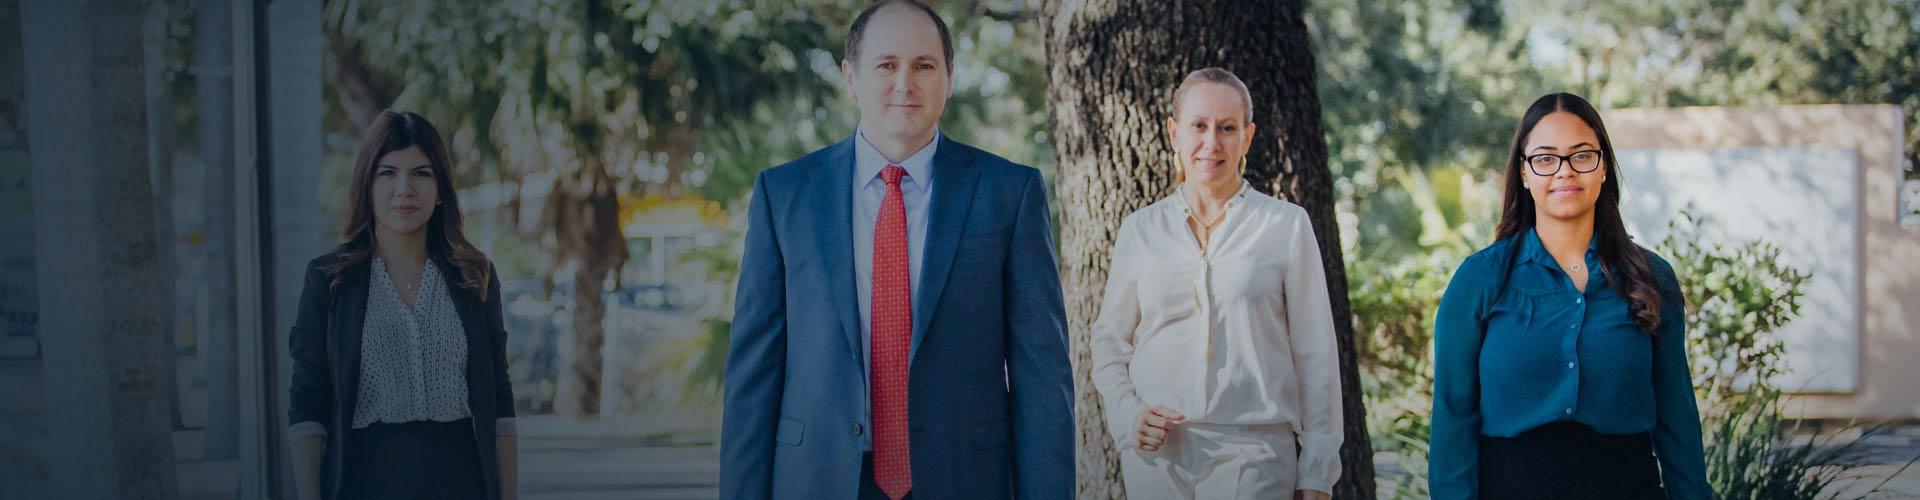 Broward Student Loan Attorneys - Stiberman Law Firm